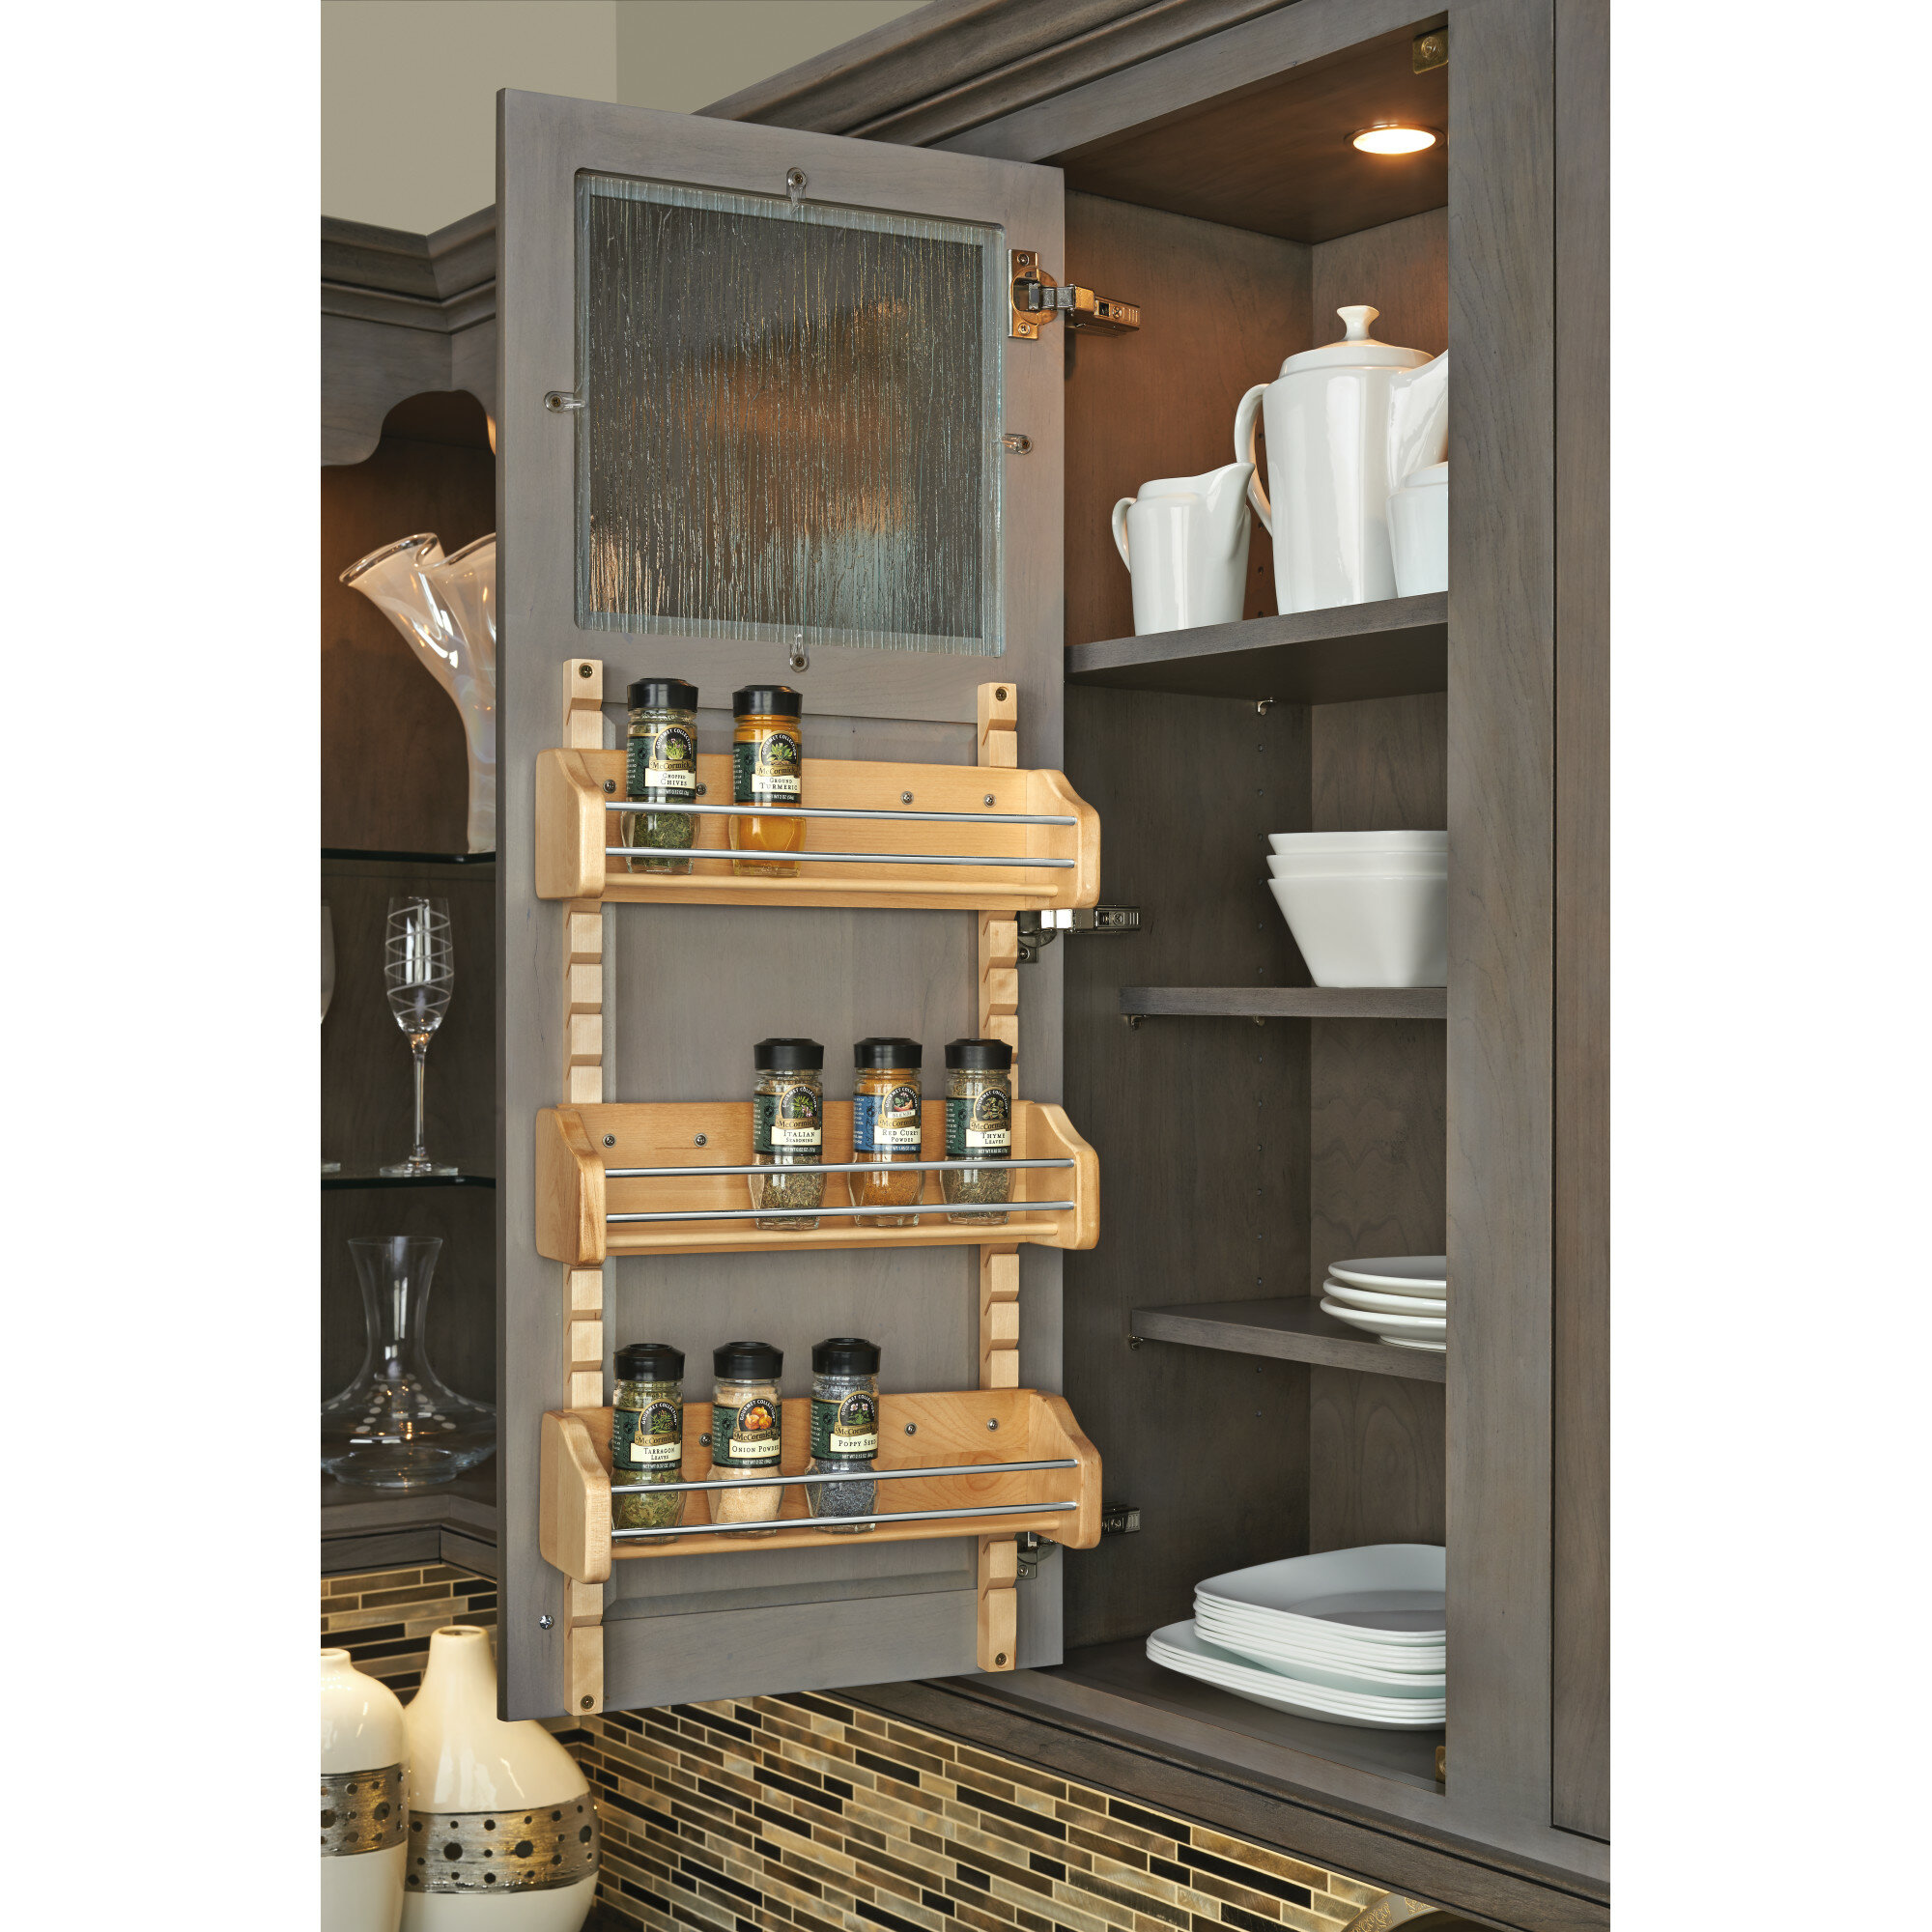 Ordinaire Spice Jar And Rack Set